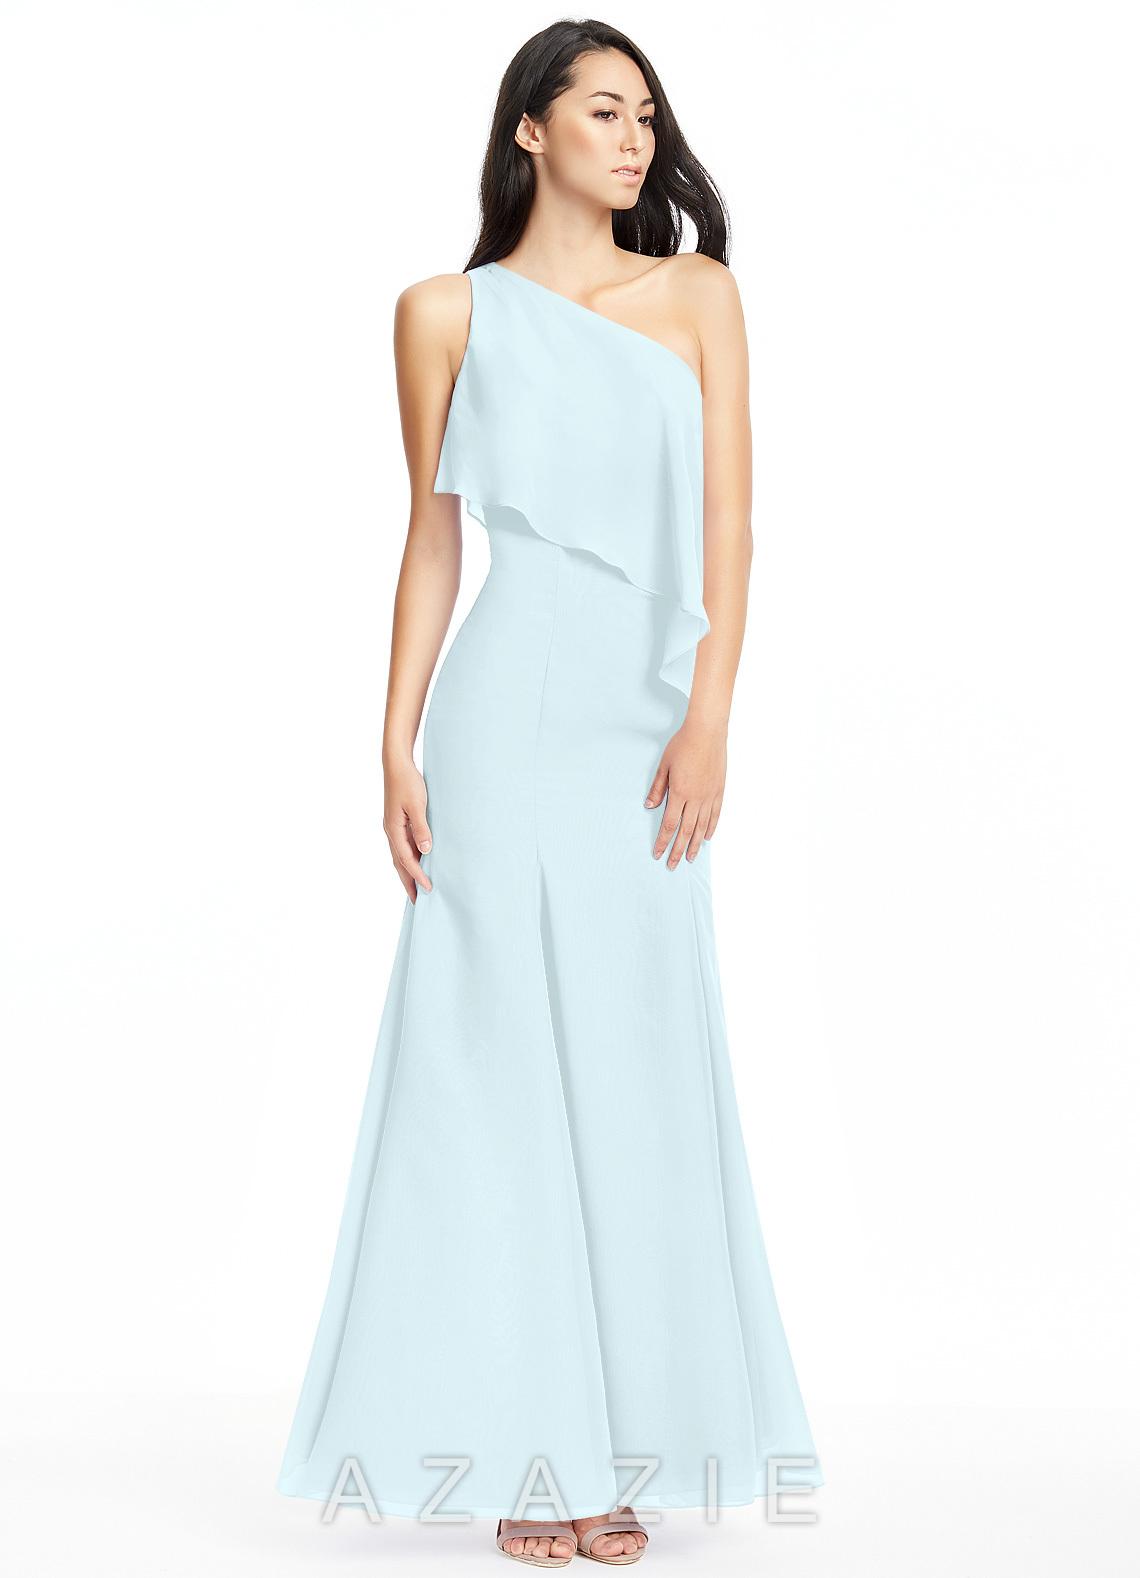 Azazie nadia bridesmaid dress azazie color mist ombrellifo Choice Image